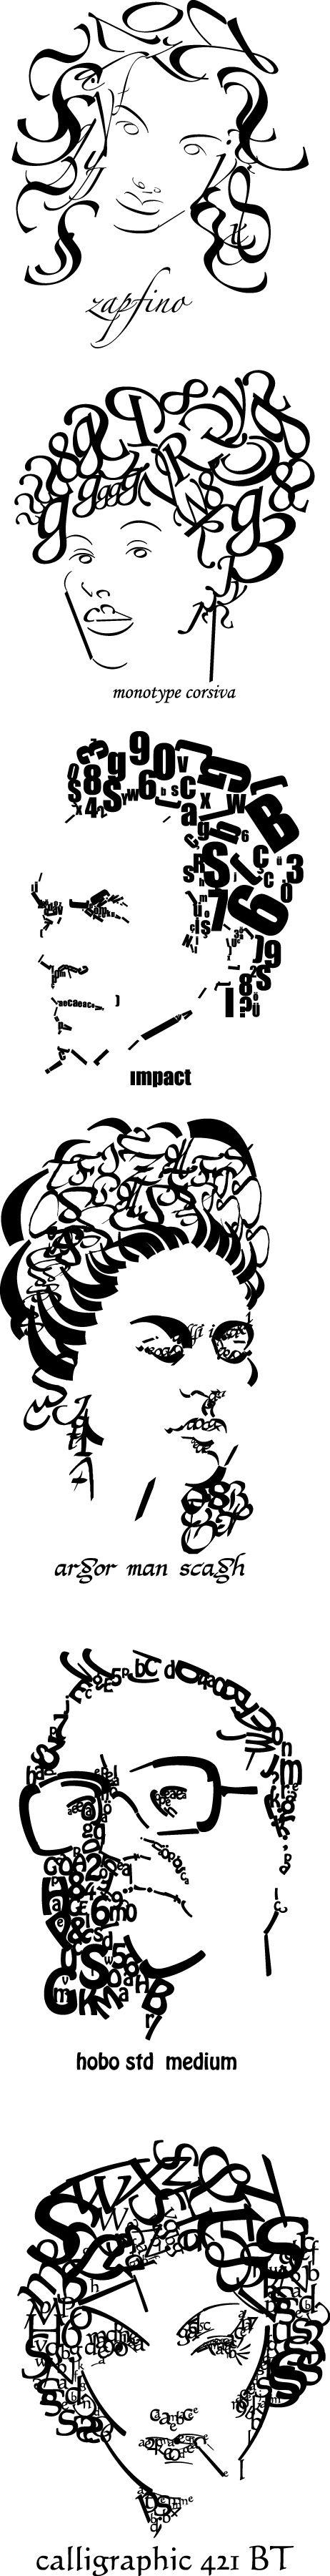 typography portrait by elif danışmaz, via Behance